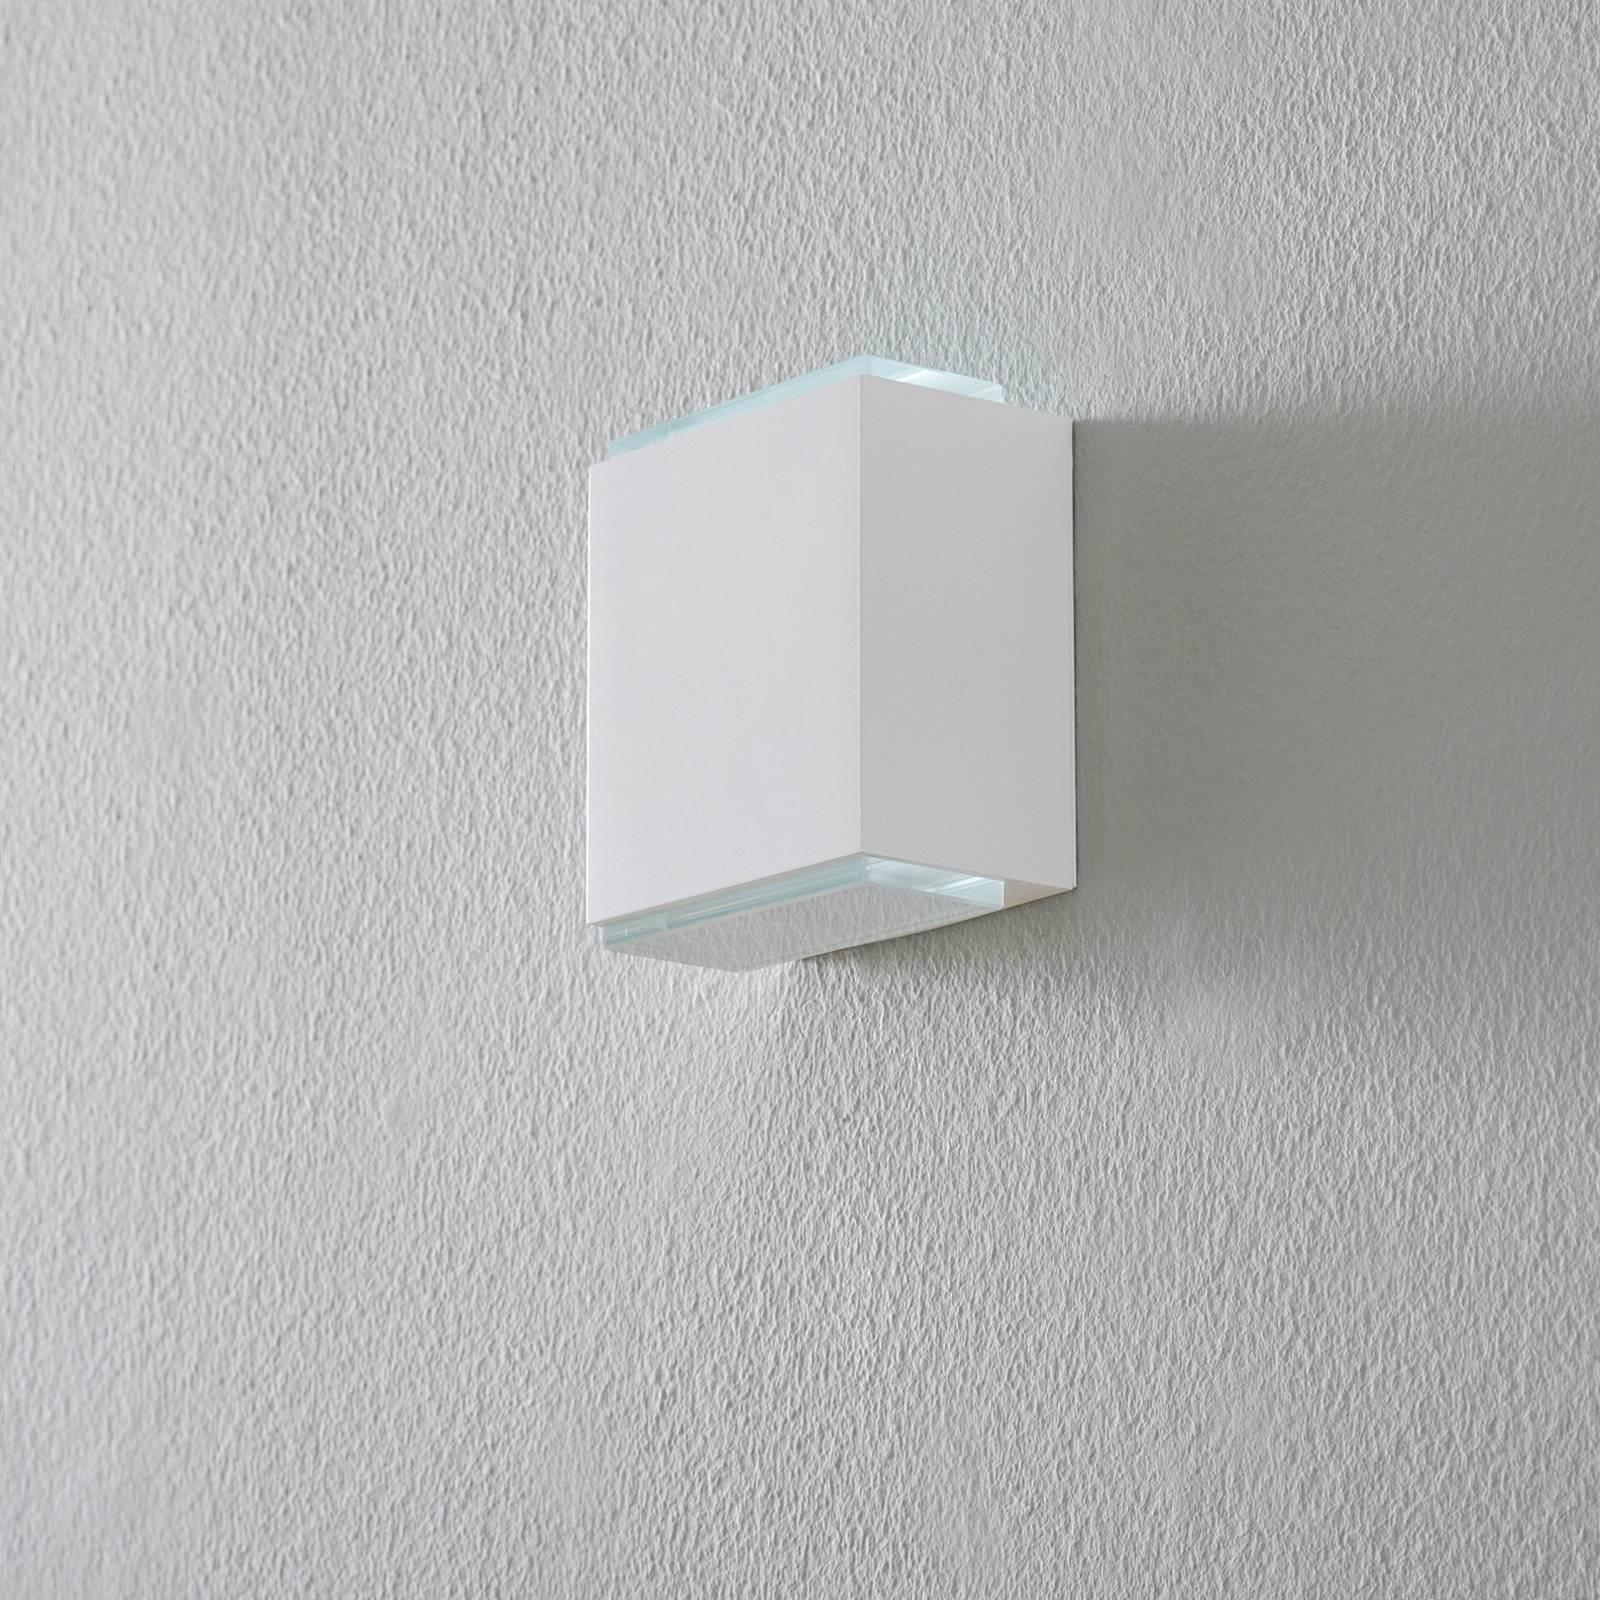 BEGA 23013 LED-vegglampe 3 000 K 9 cm 510lm hvit